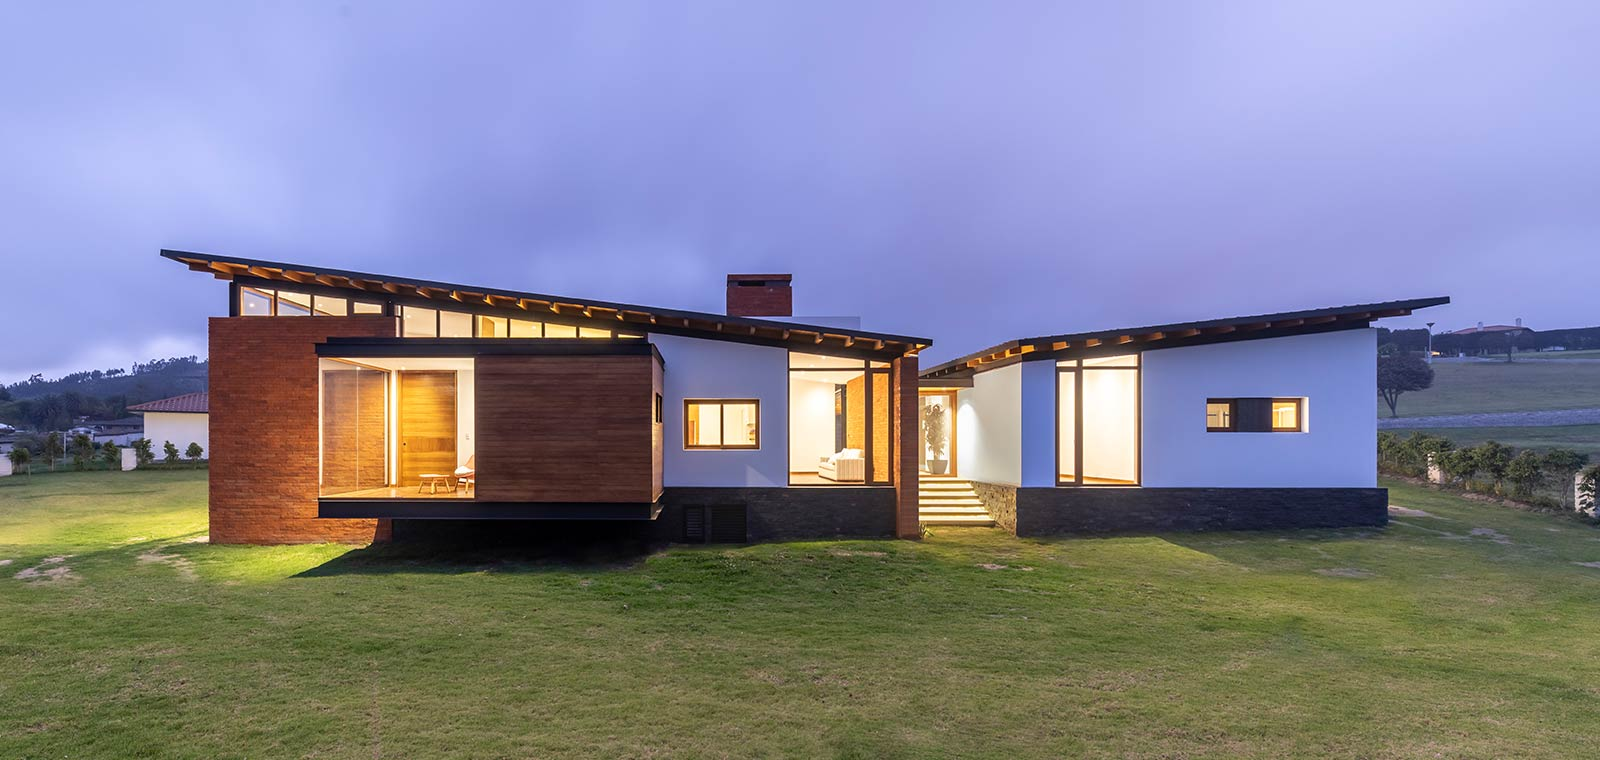 House AO by Studio Alfa located in Ecuador